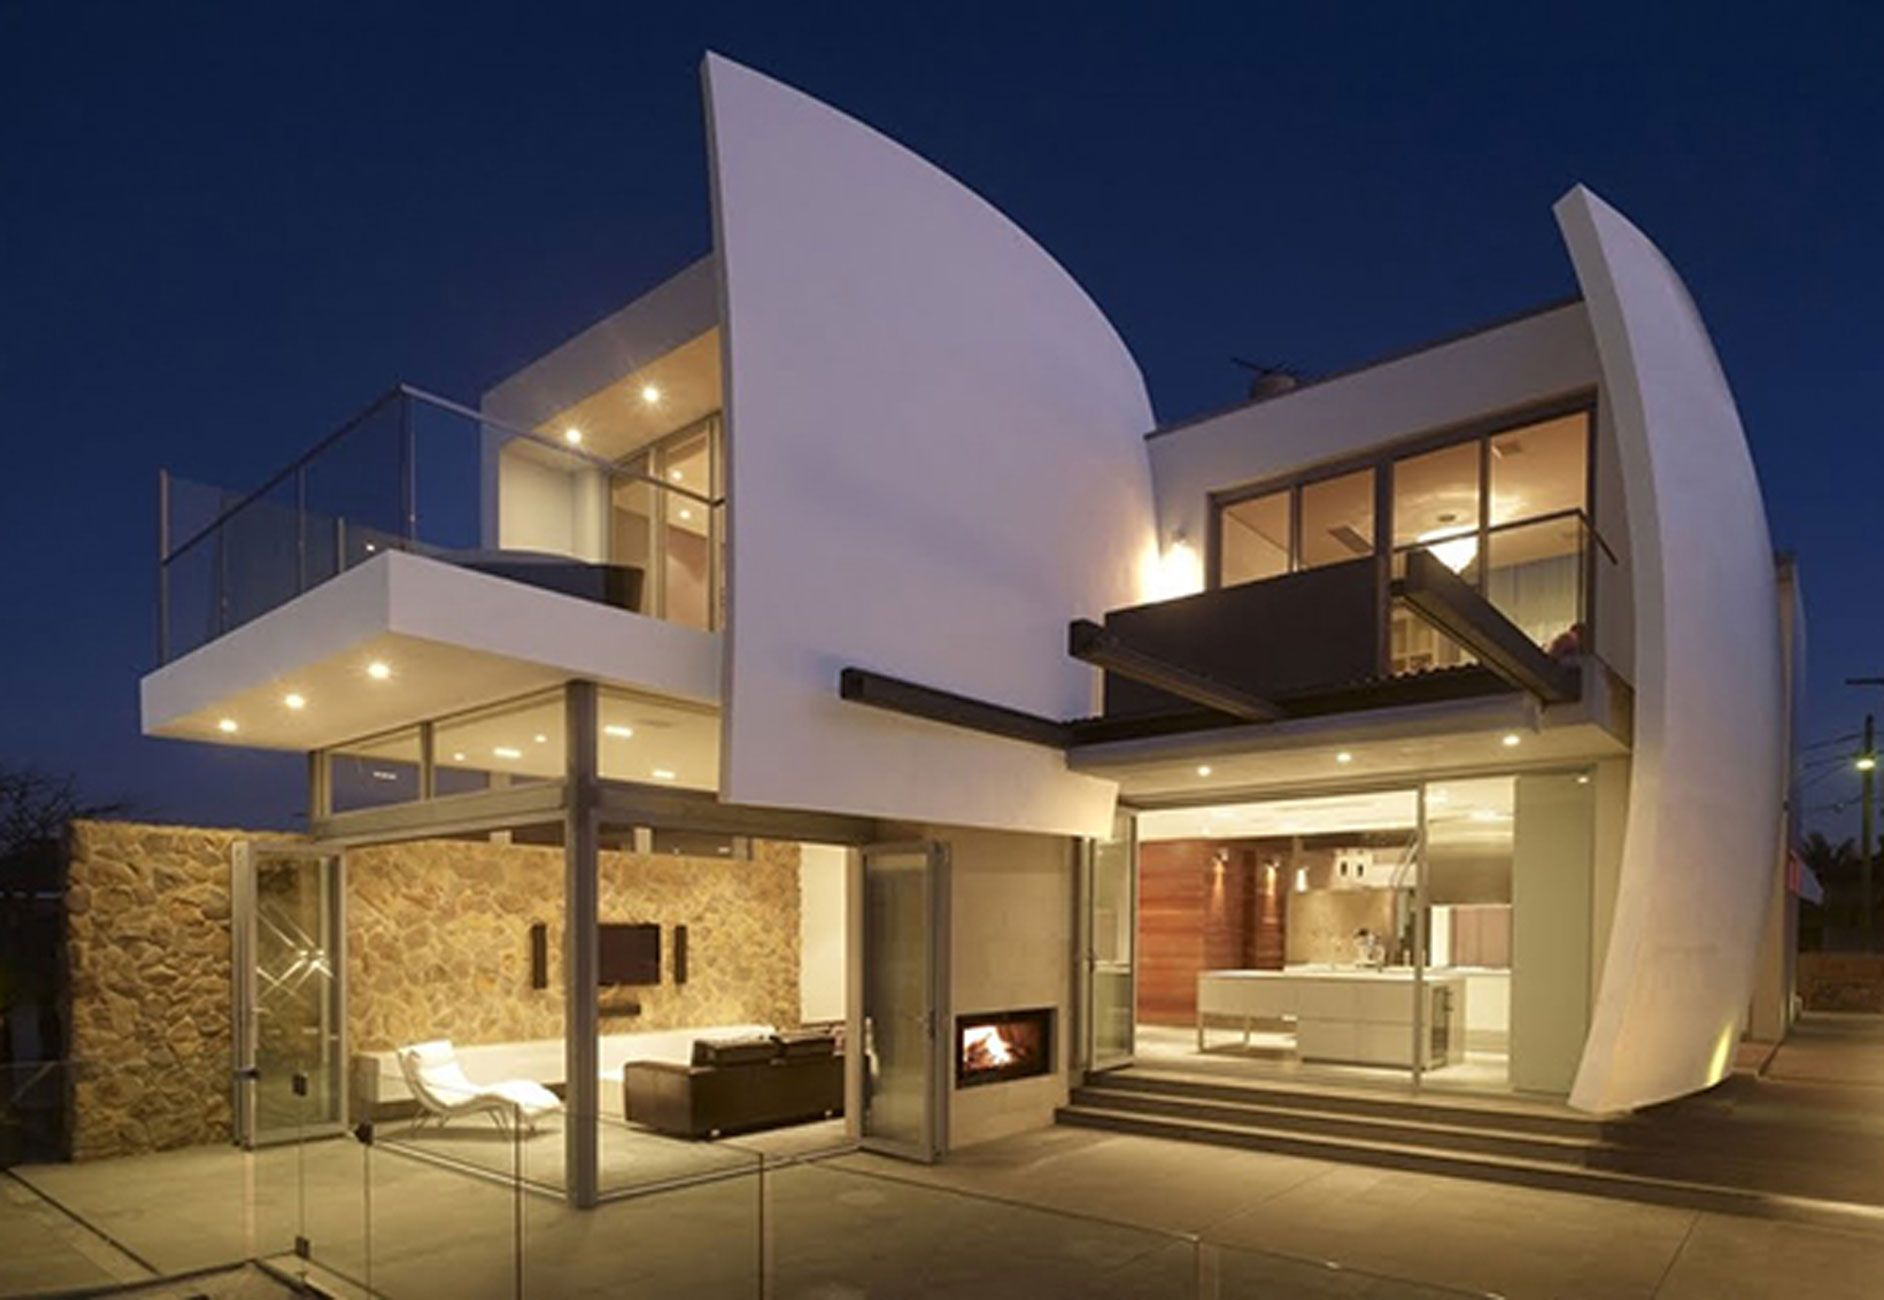 1000 Images About Best House Design On Pinterest Best Home Design